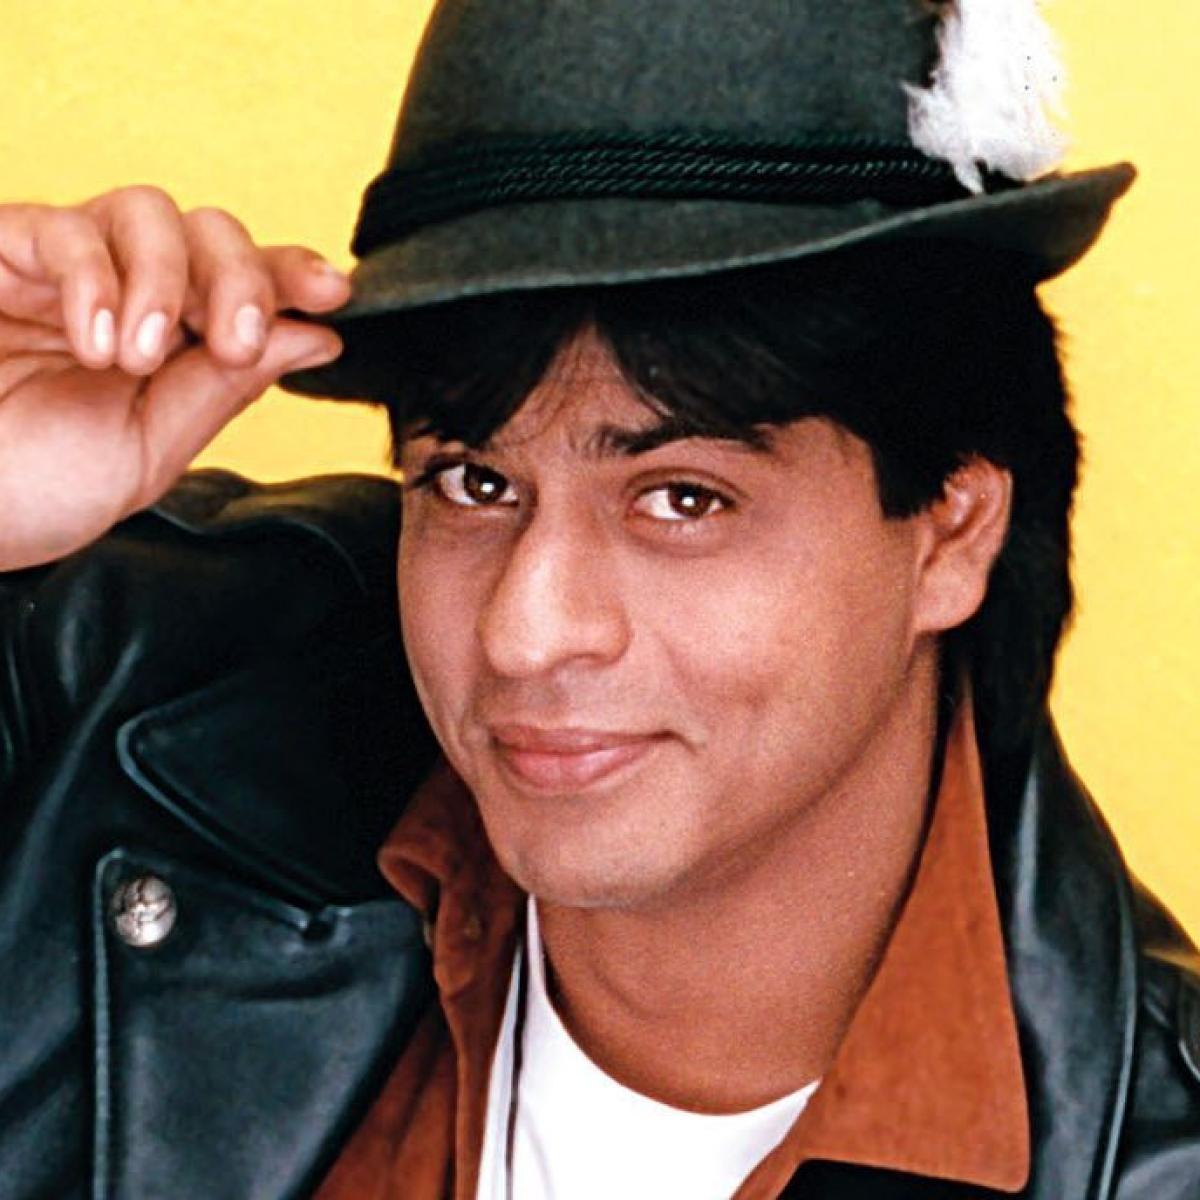 25 years of DDLJ: Shah Rukh Khan renames Twitter handle, shares special video